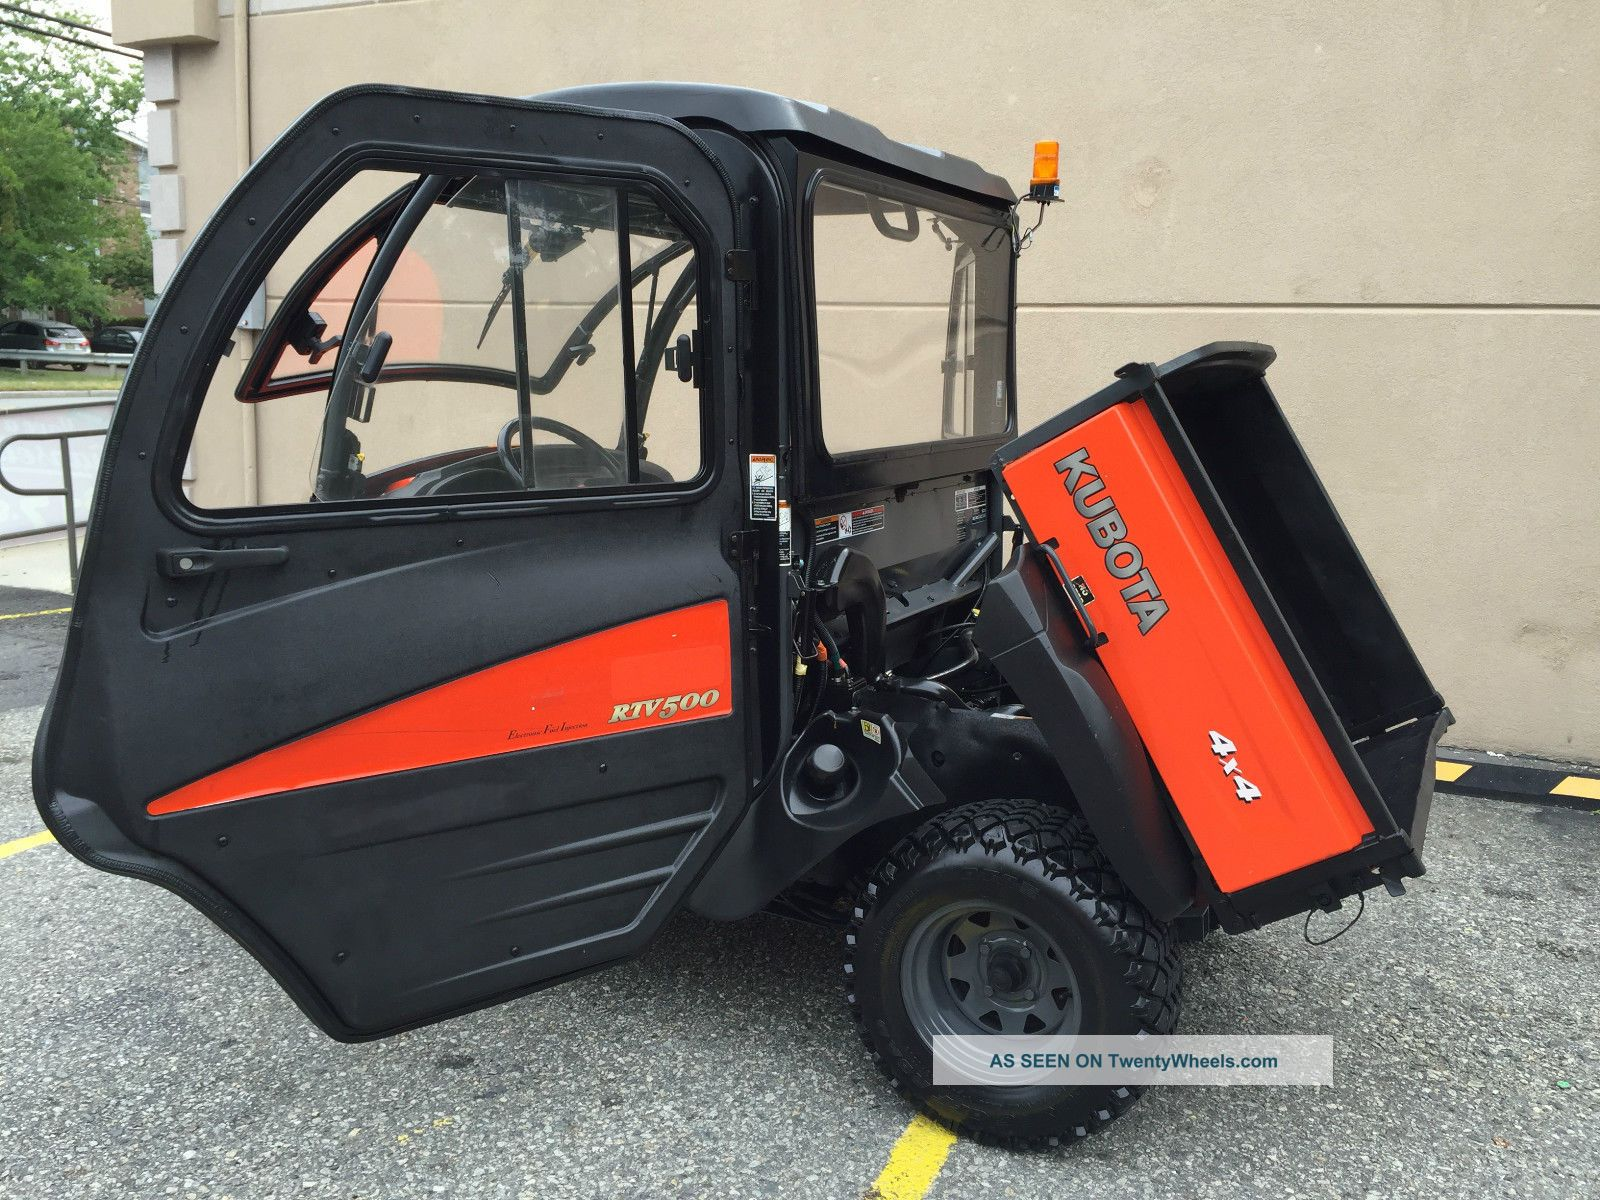 Loaded Fully Inclosed Kubota Rtv500 Heater Winch Plow